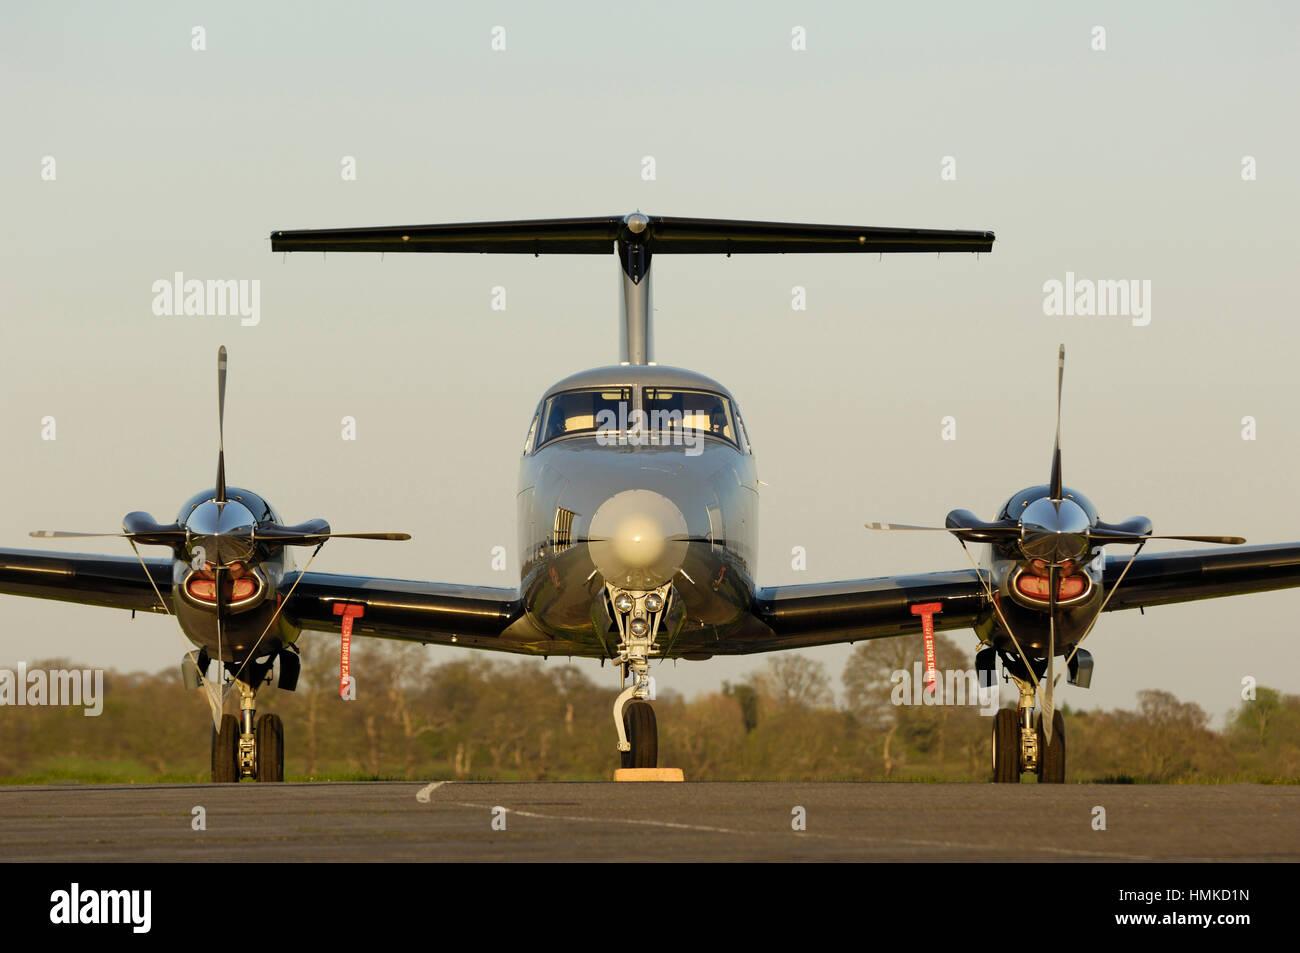 Sinergia Aviation Beechcraft King Air B200 estacionado Imagen De Stock